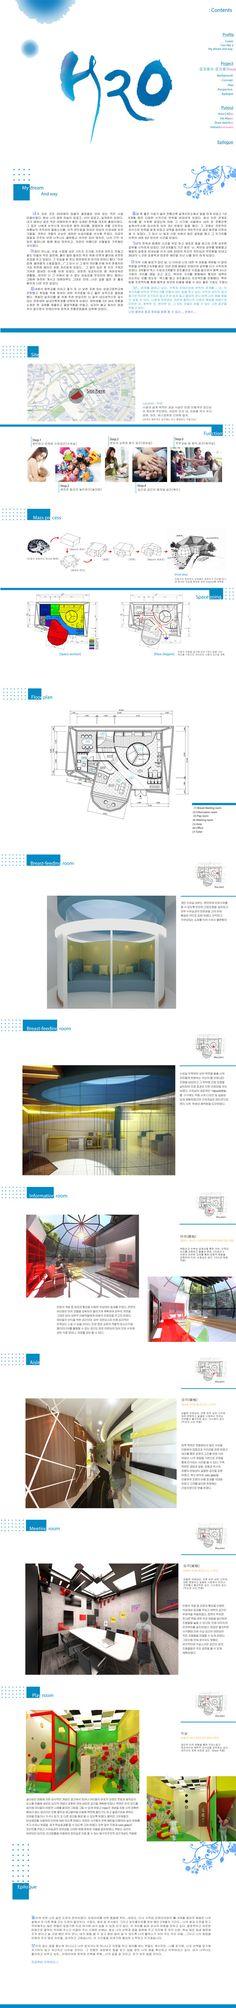 goodesign :) :: 2013/04 글 목록 (3 Page)